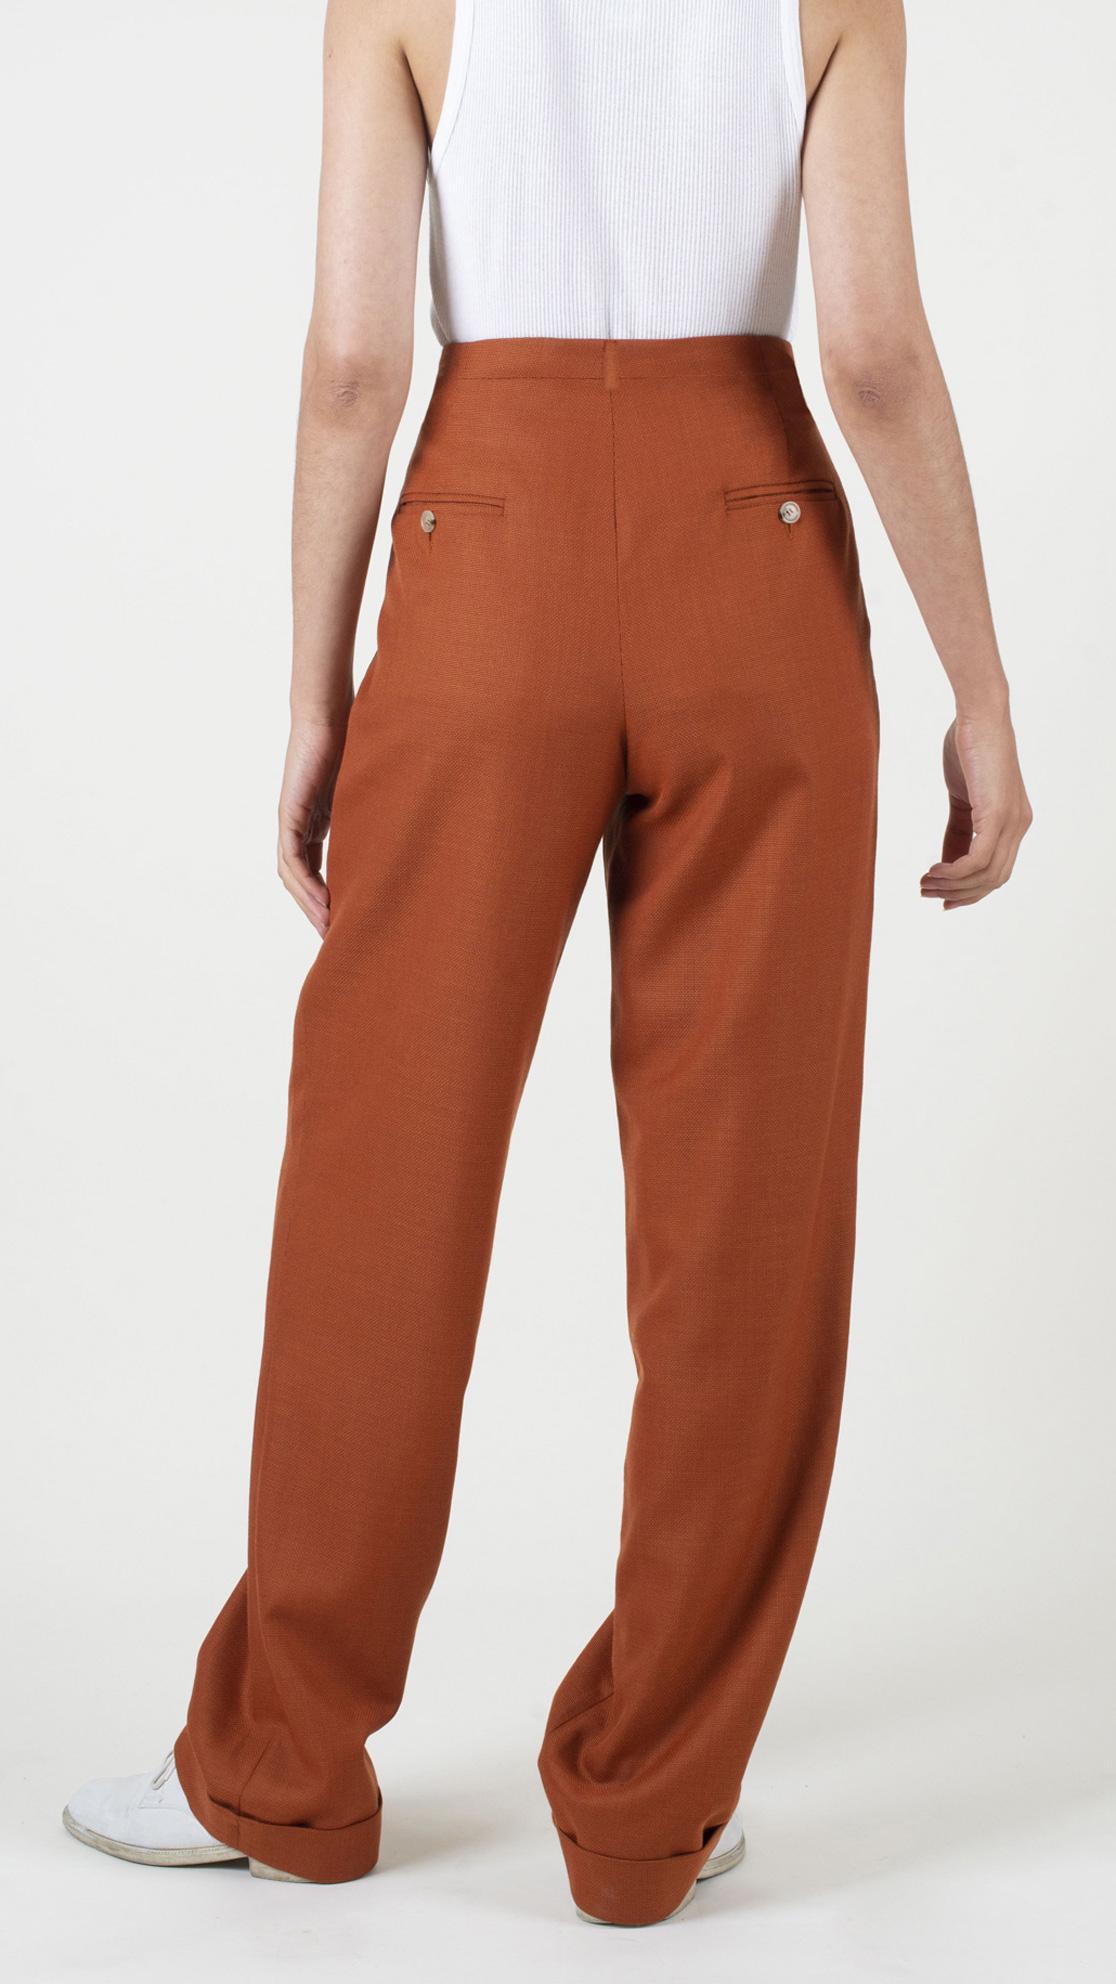 DADA-Diane-Ducasse-AH21-pantalon-droit-jules-laine-orange-dos